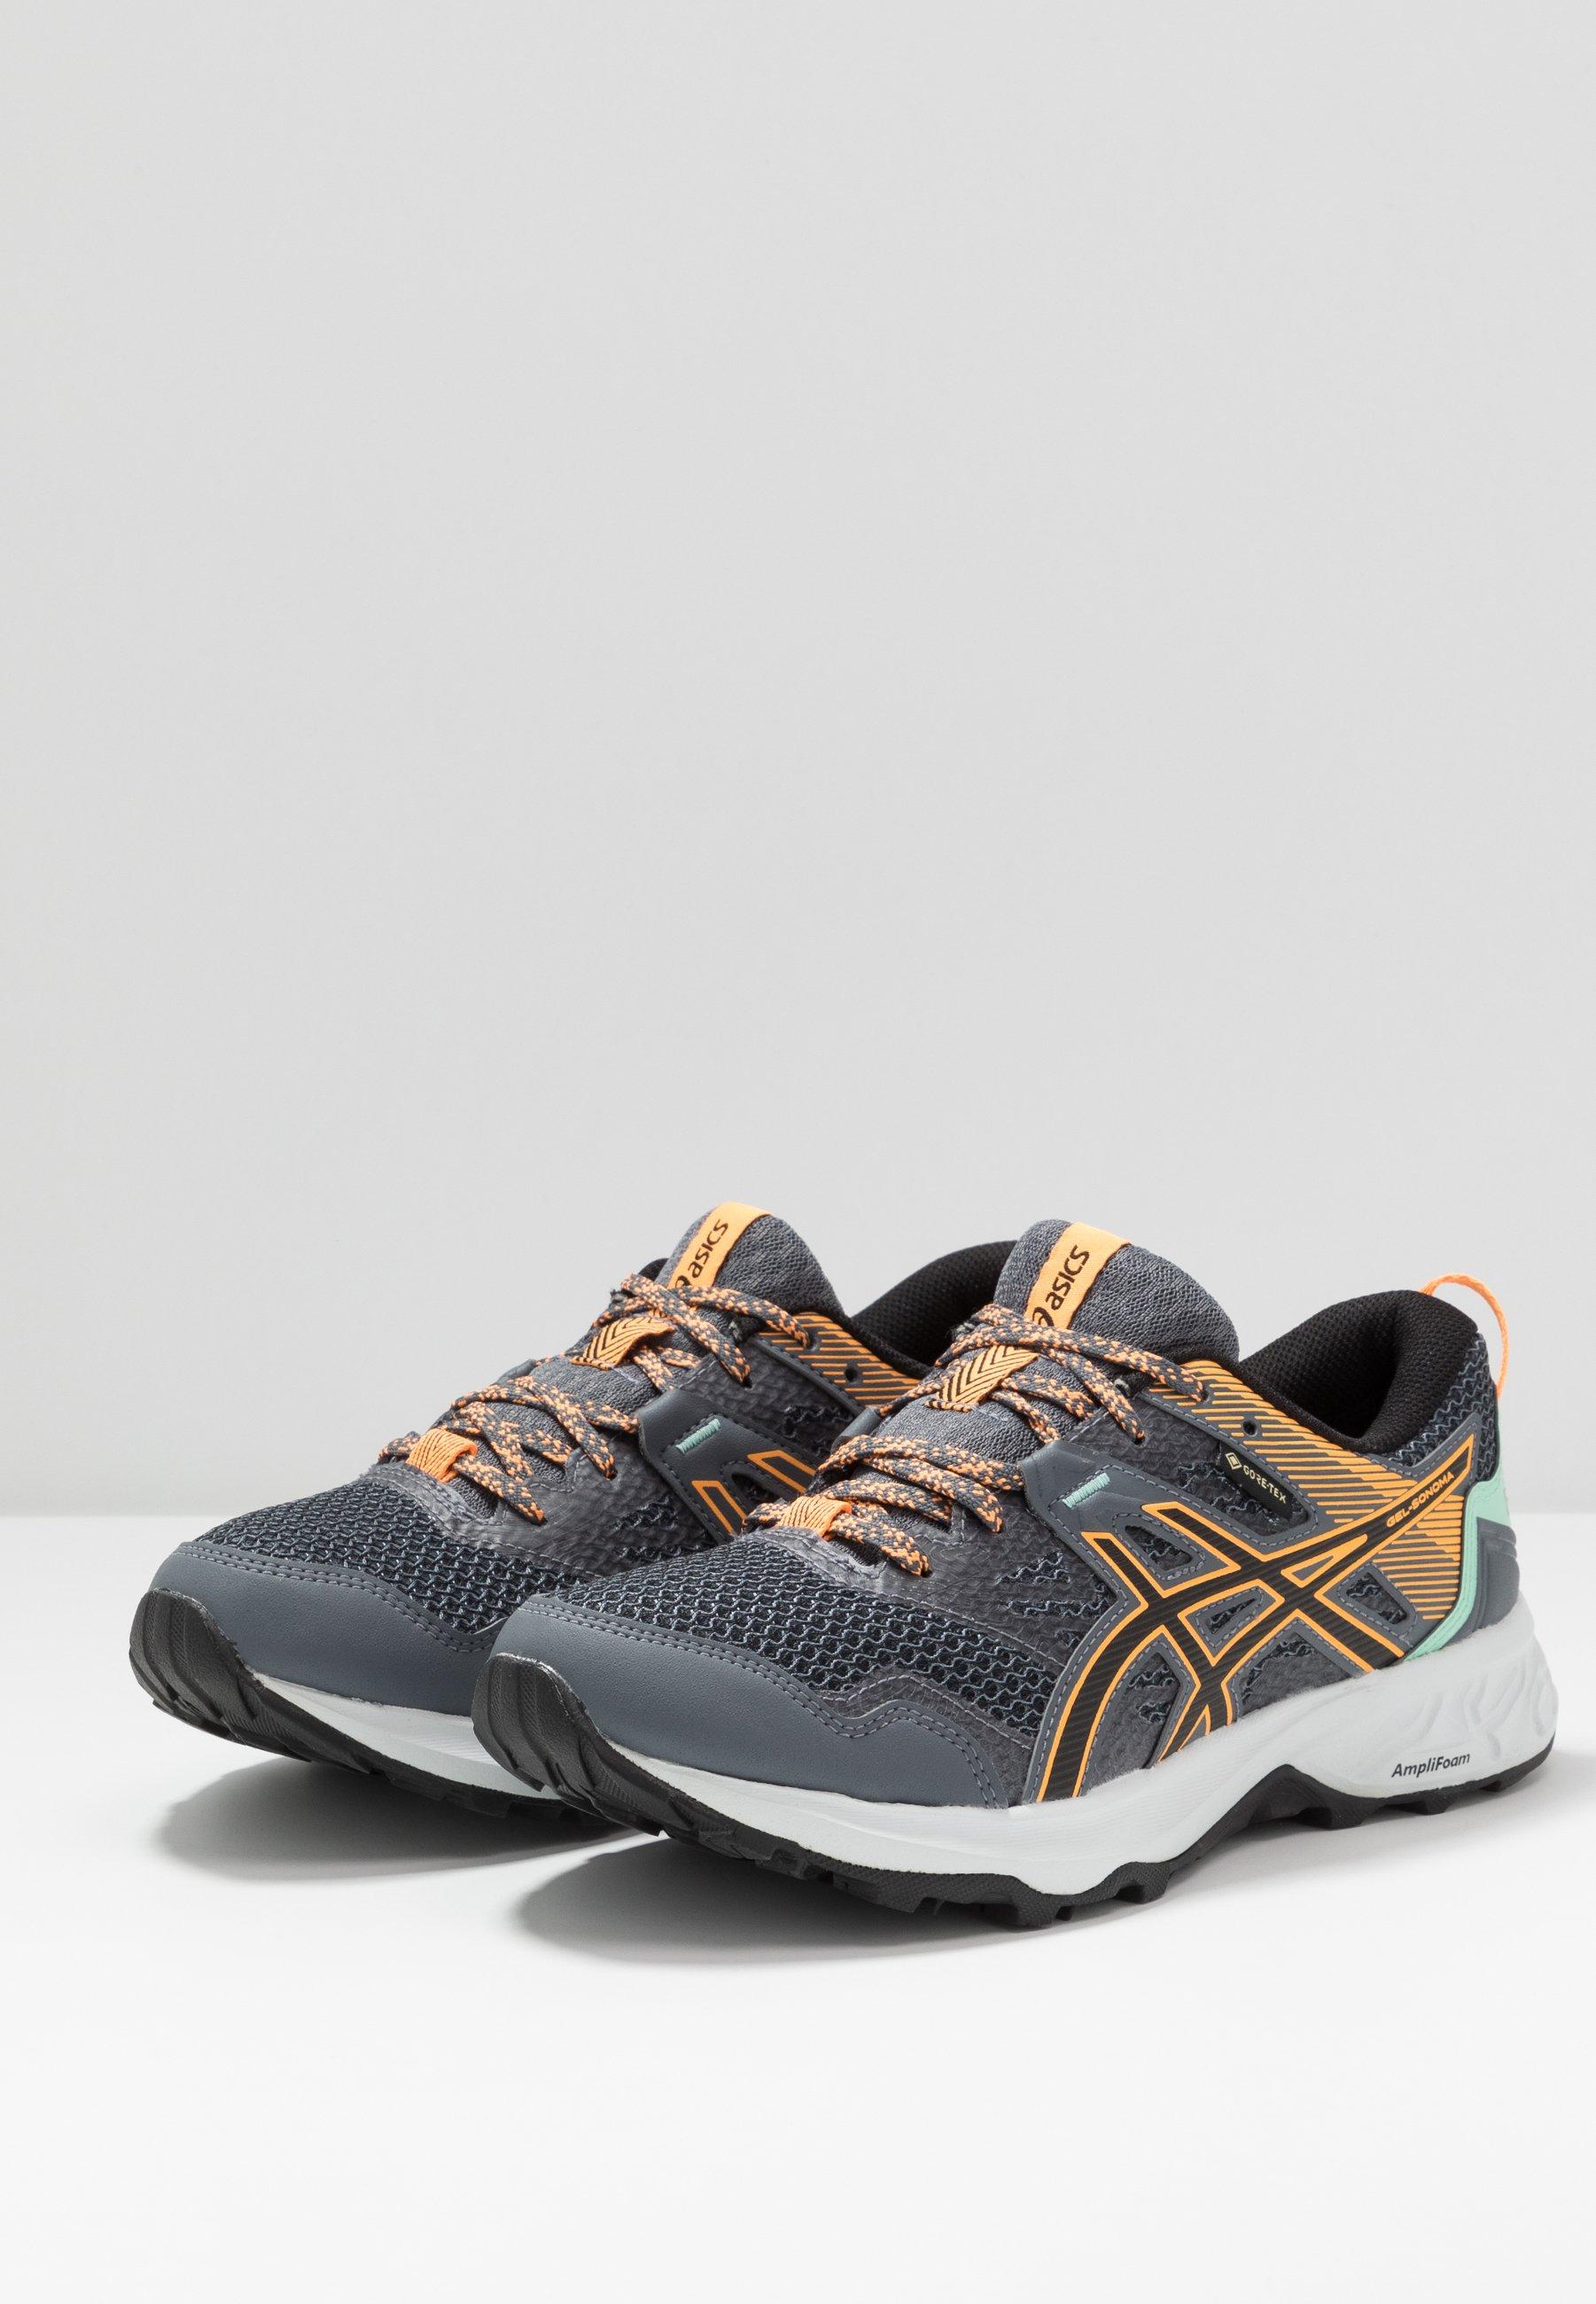 Asics Gel-sonoma 5 G-tx - Chaussures De Running Metropolis/black